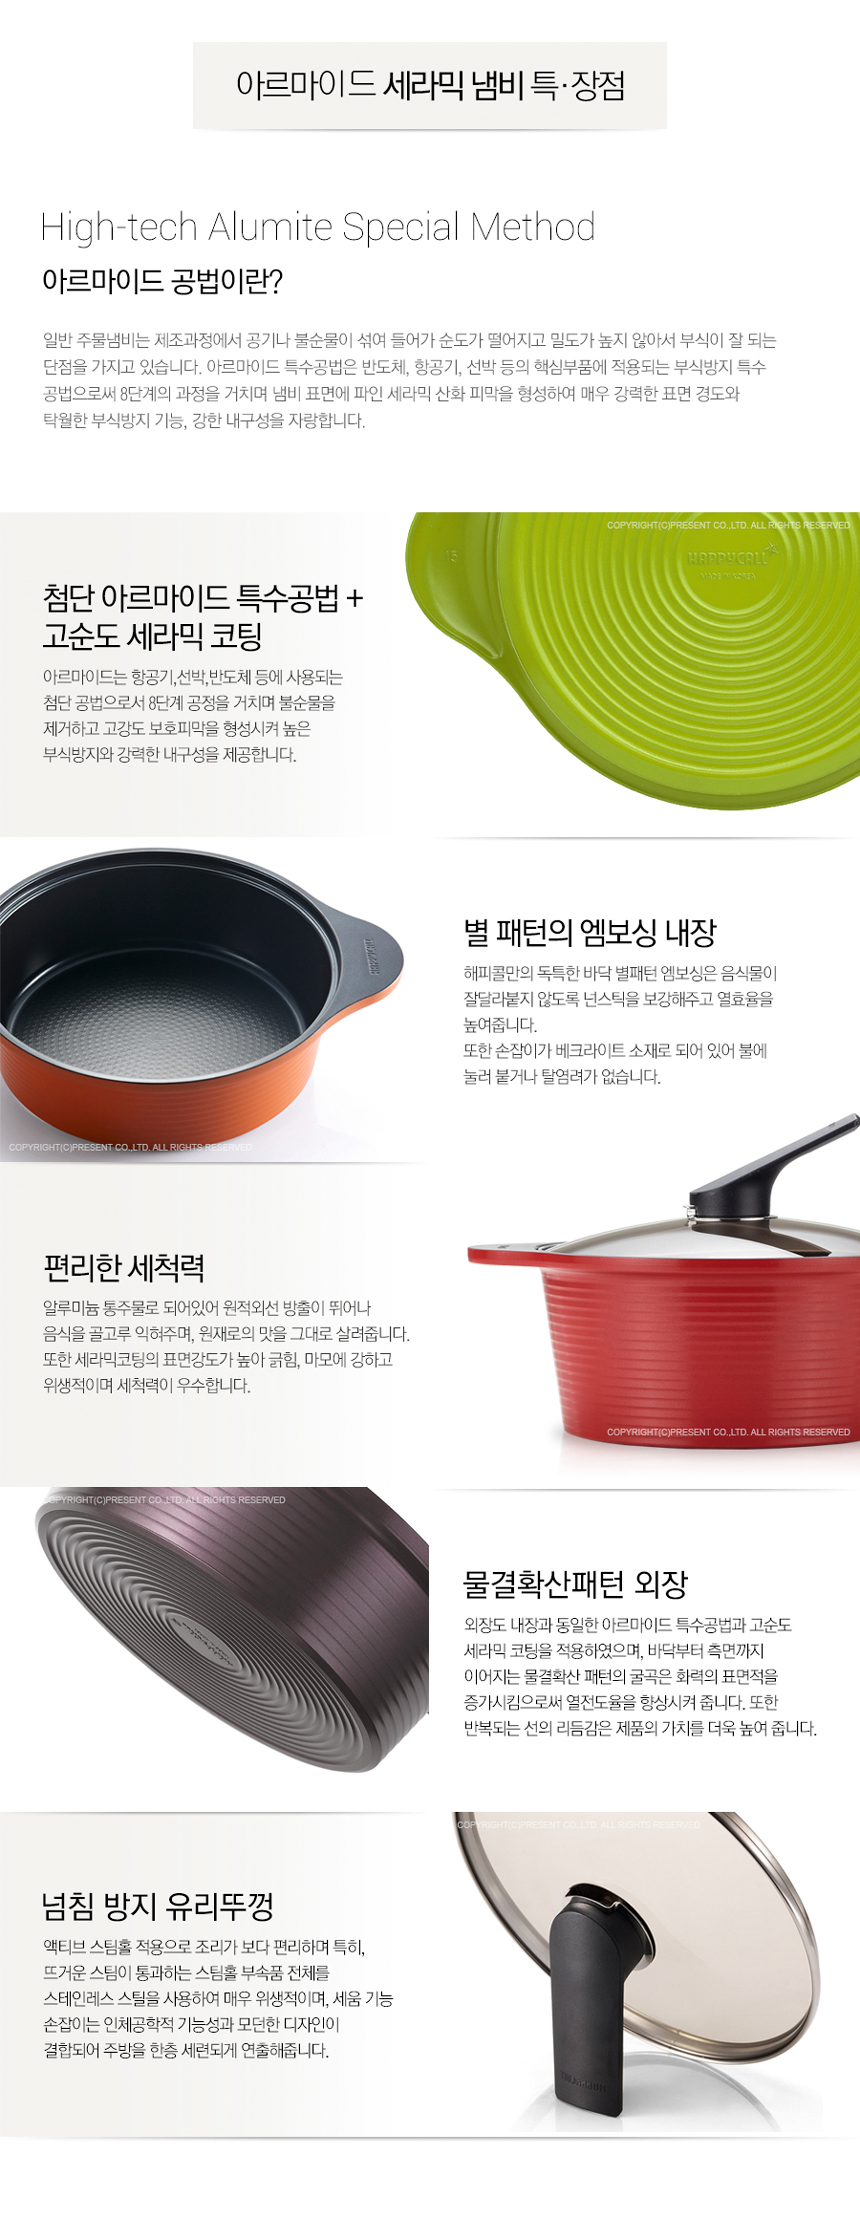 G마켓 - 해피콜 New 세라믹 냄비세트 5종